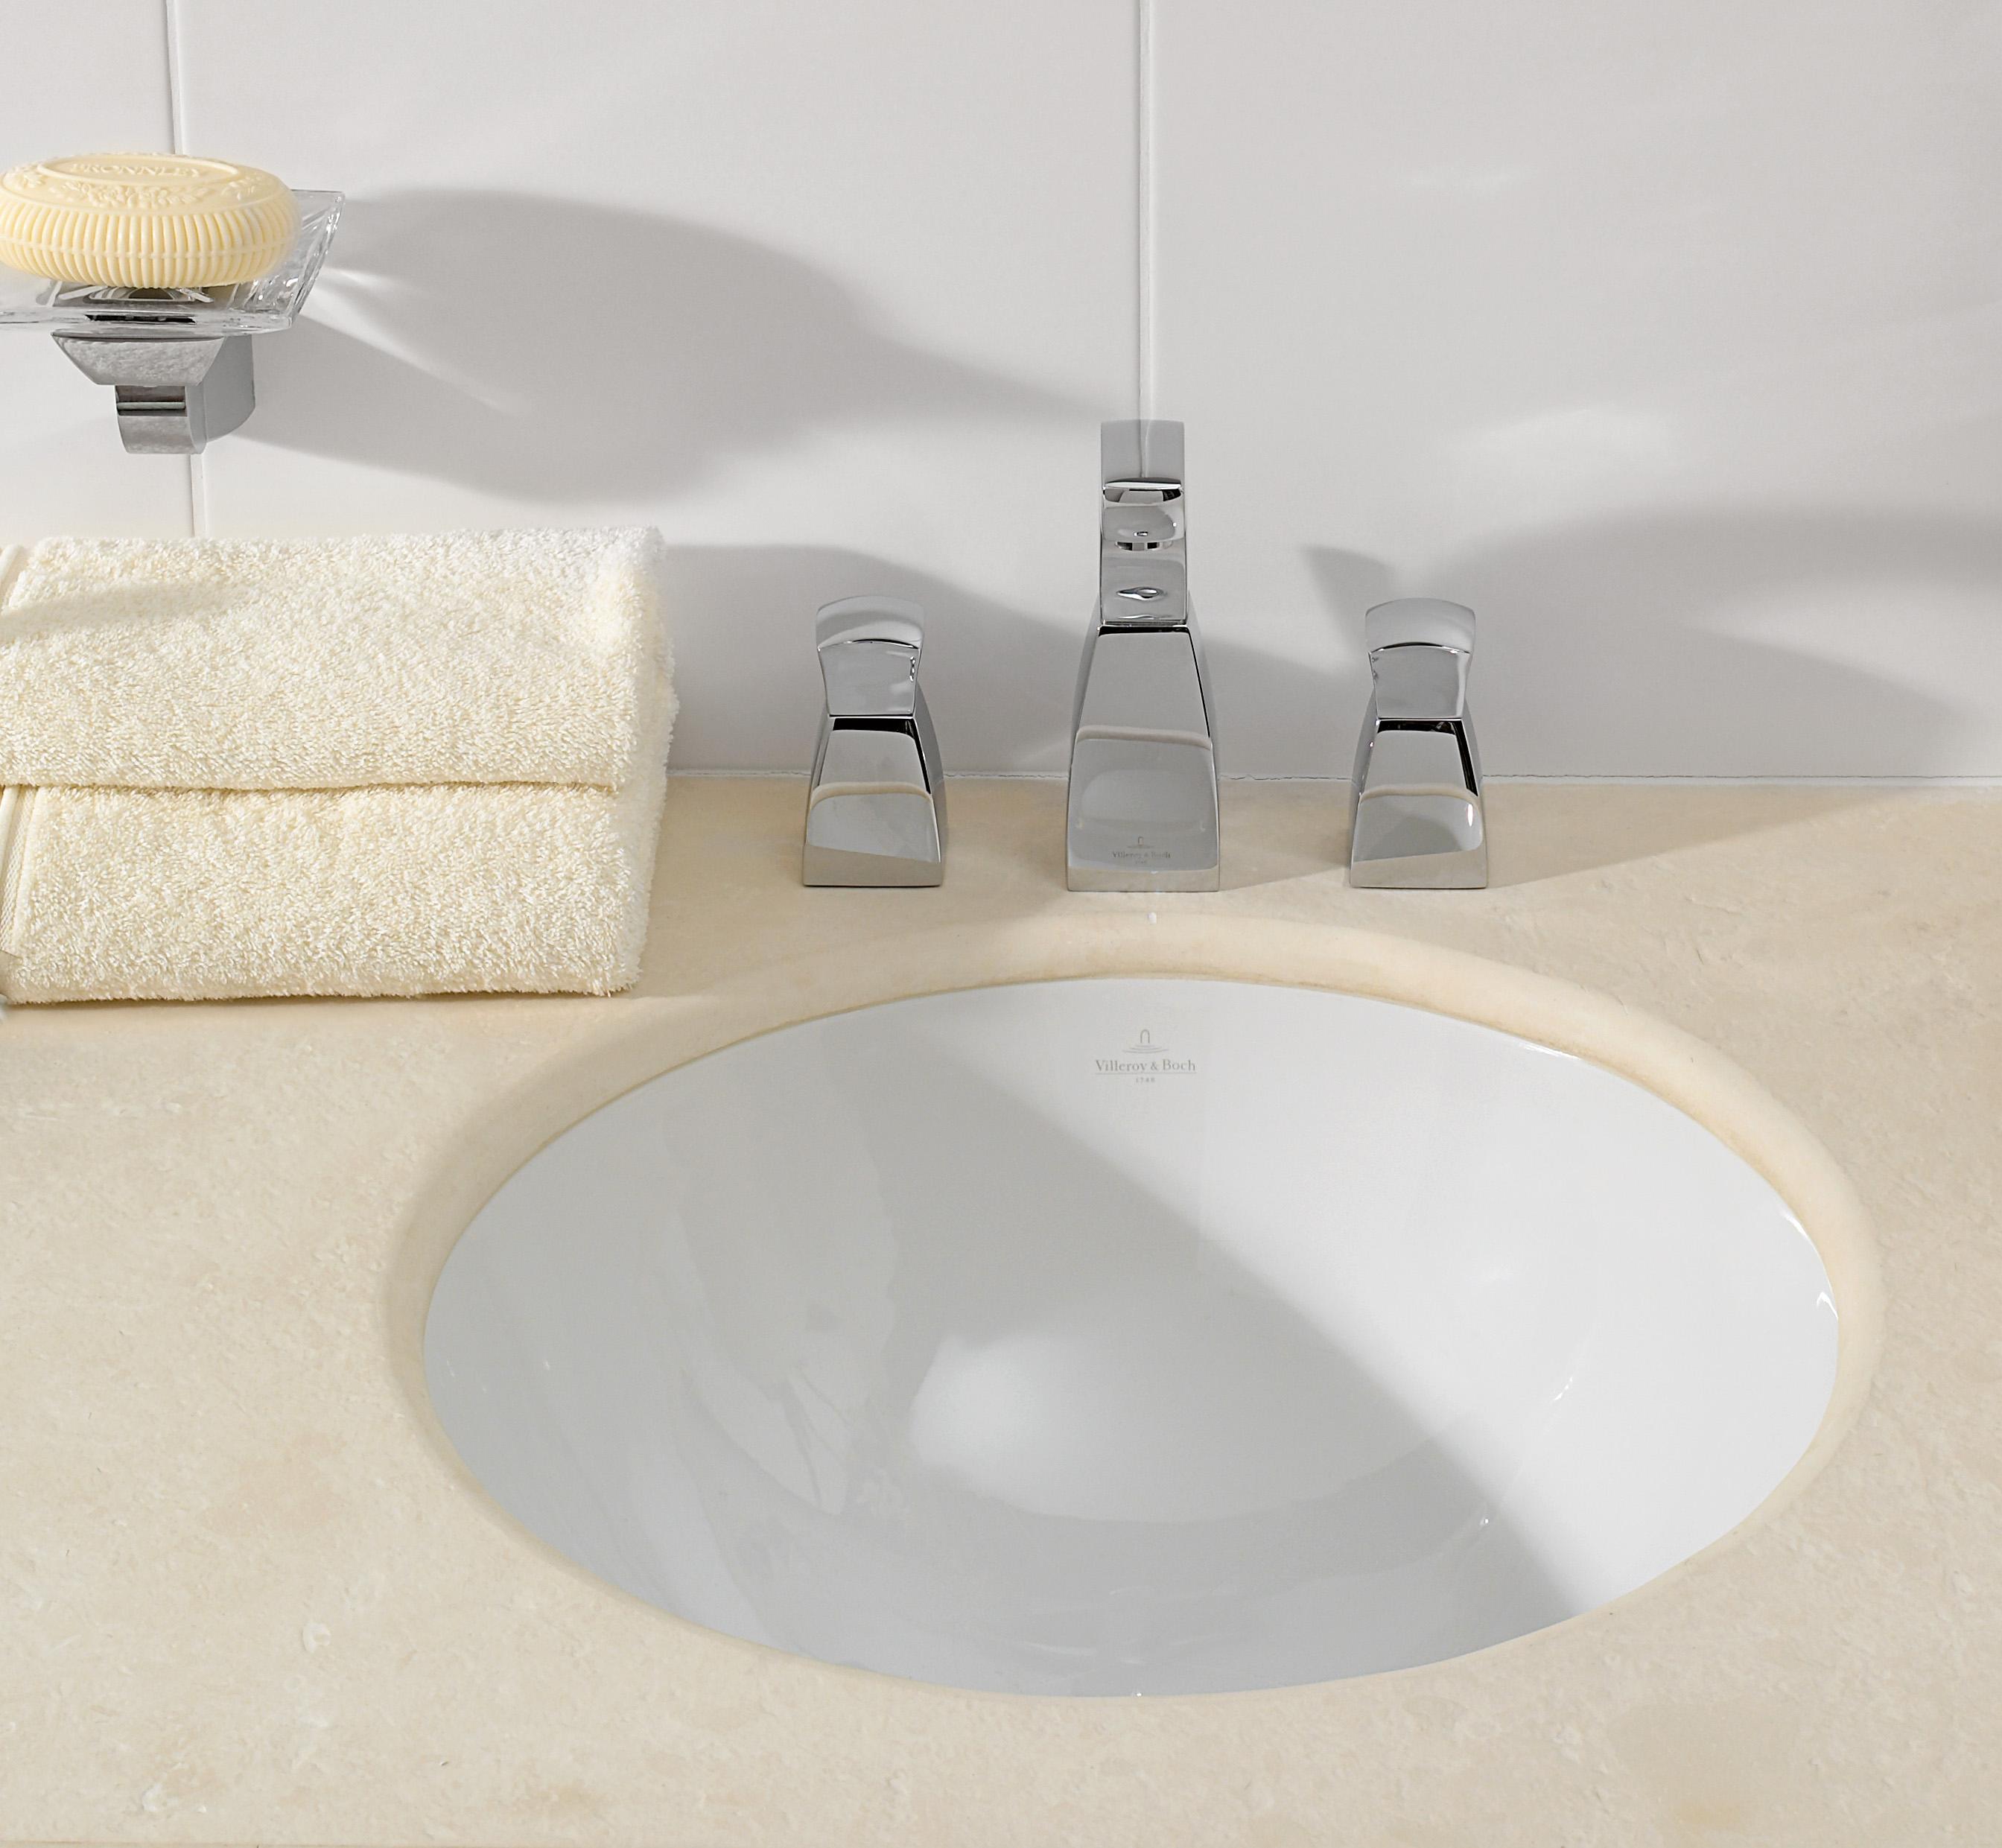 Loop & Friends Washbasin, Undercounter washbasin, Washbasins, Undercounter washbasins